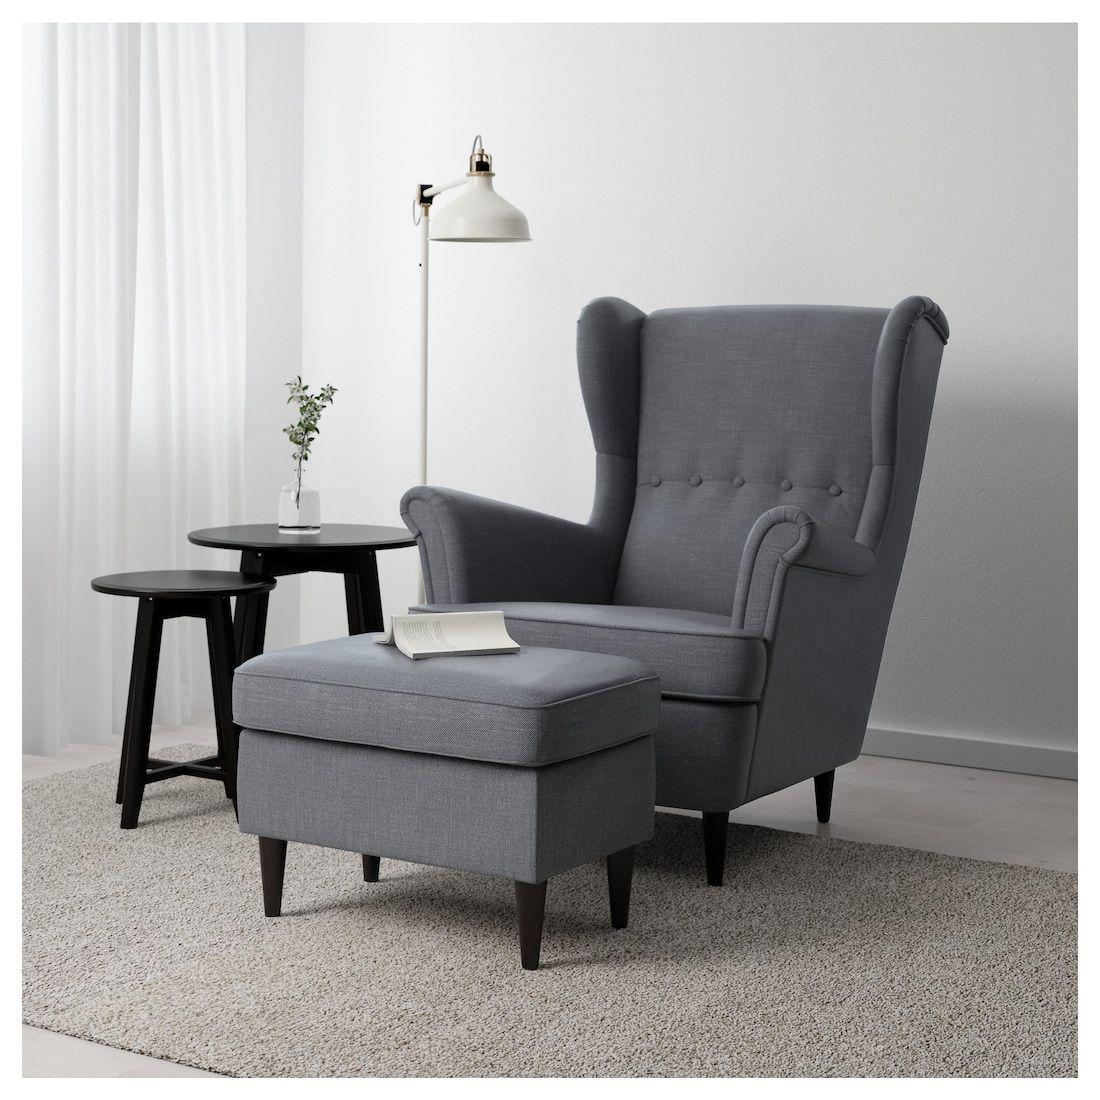 Strandmon Nordvalla Dark Grey Footstool Ikea In 2020 Comfy Chairs Yellow Living Room Yellow Chair